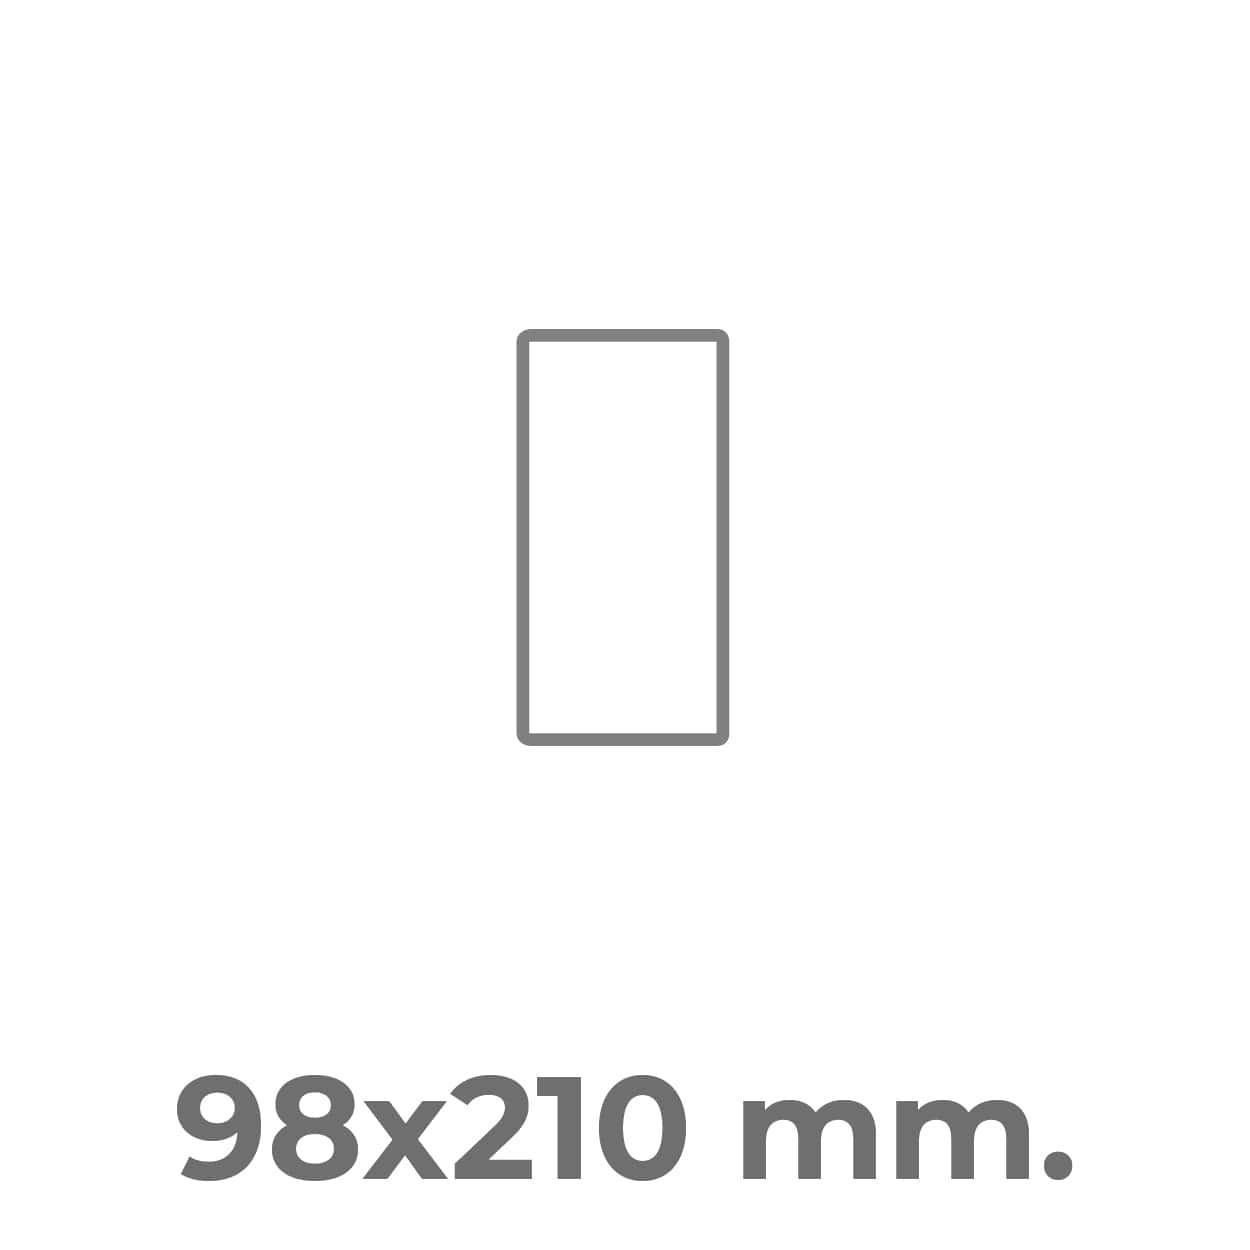 etichette squadrate 98x210